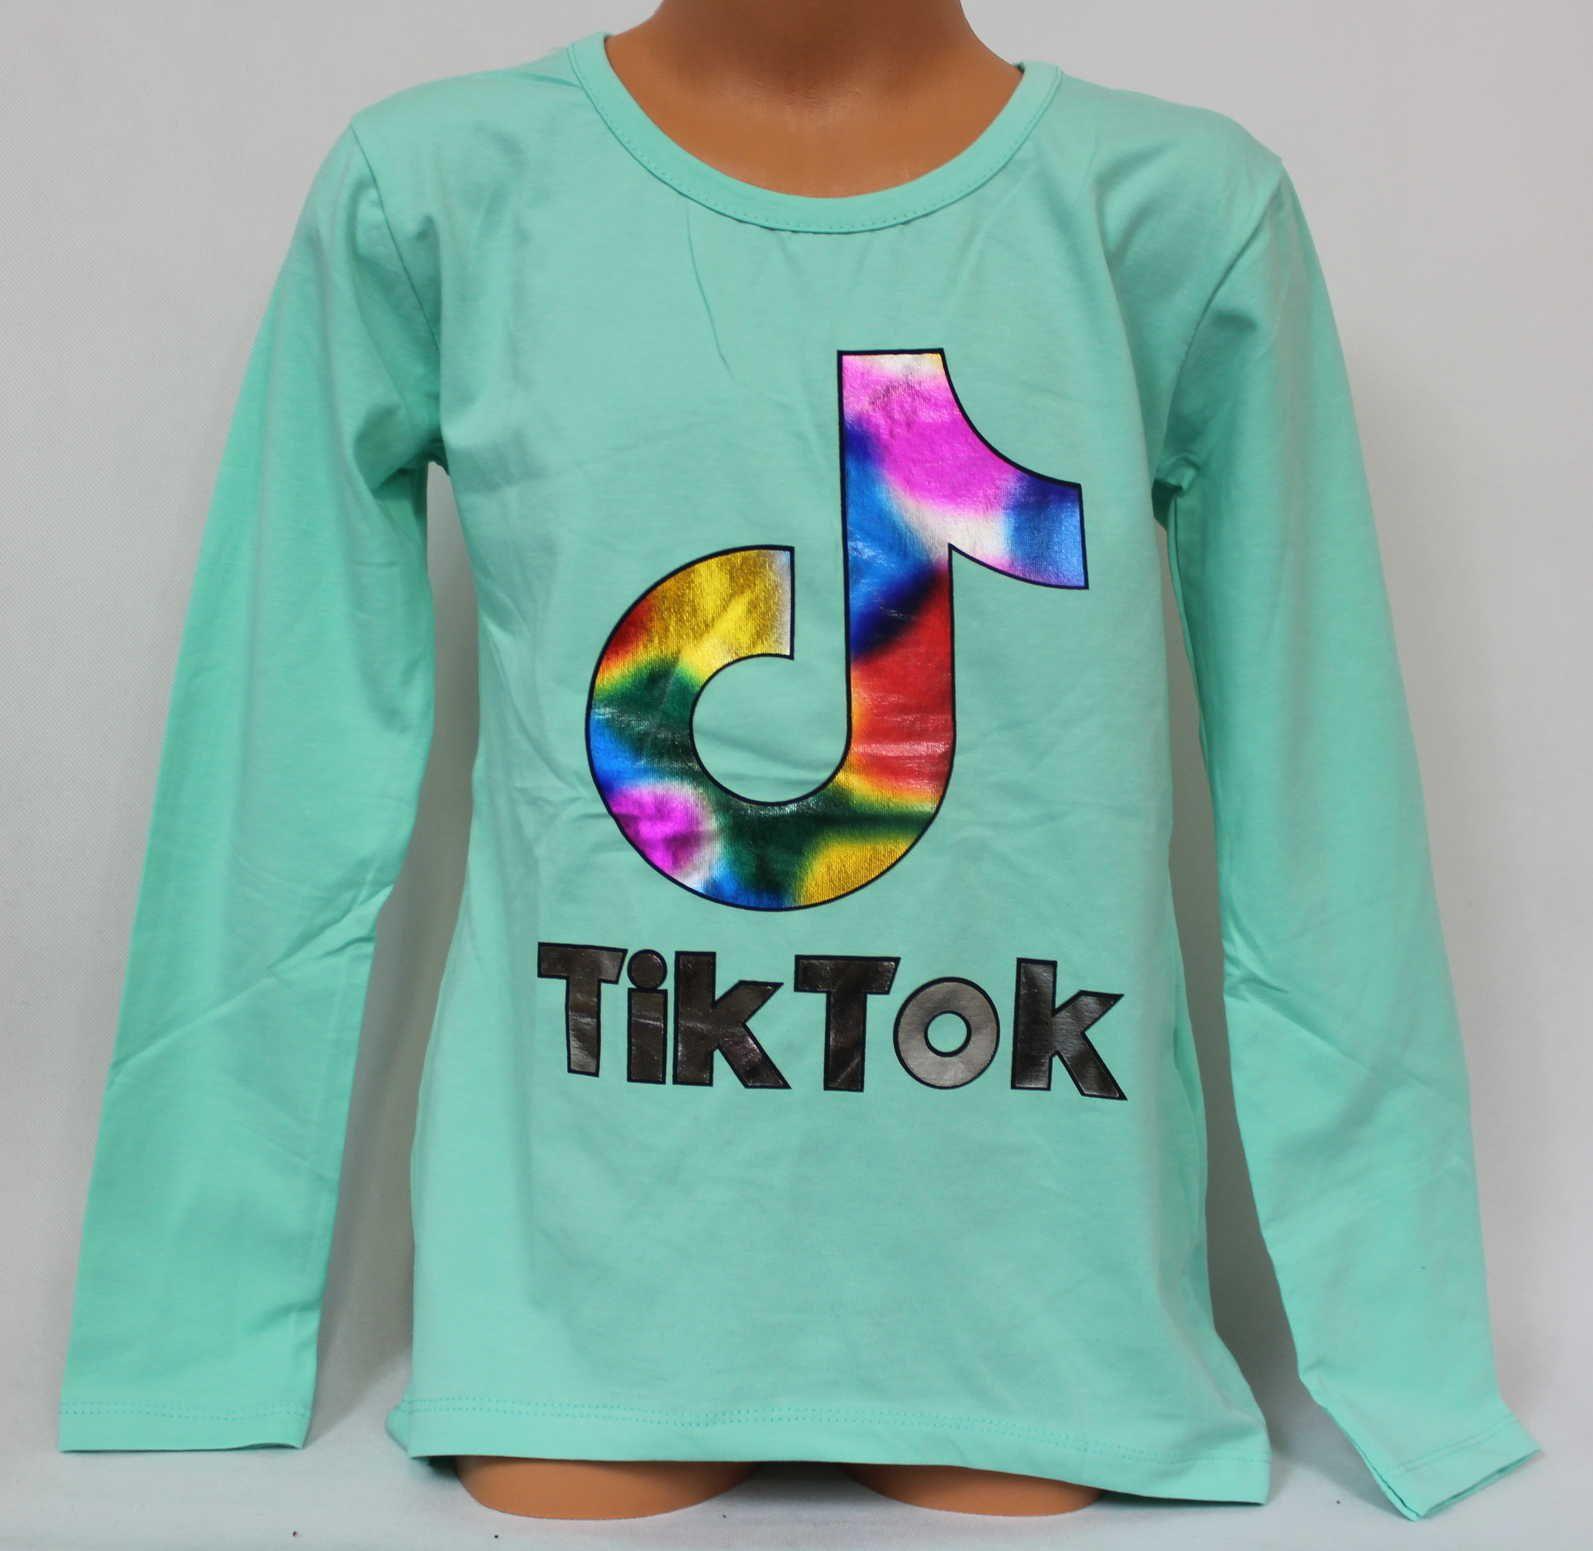 Tik Tok tričko, triko dlouhý rukáv Tik Tok, bavlněné tričko Tik Tok, dívčí tričko TIK TOK